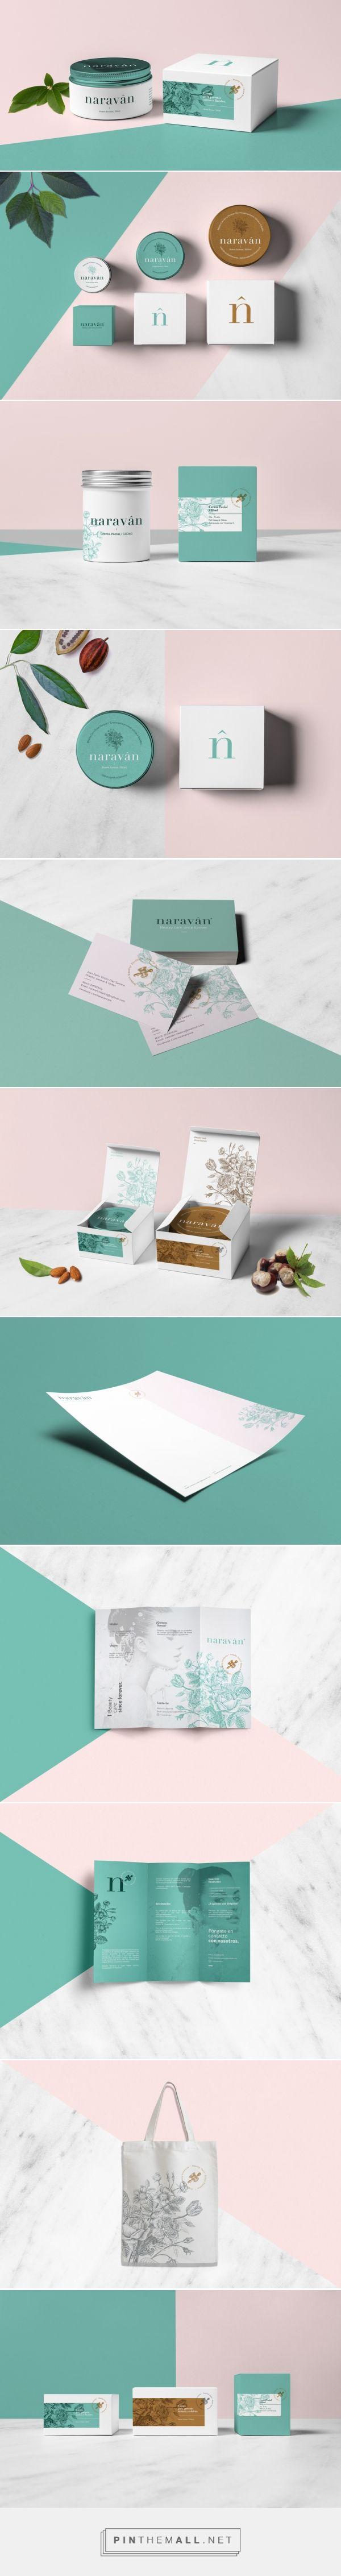 Naravân — The Dieline - Branding & Packaging - created via http://pinthemall.net